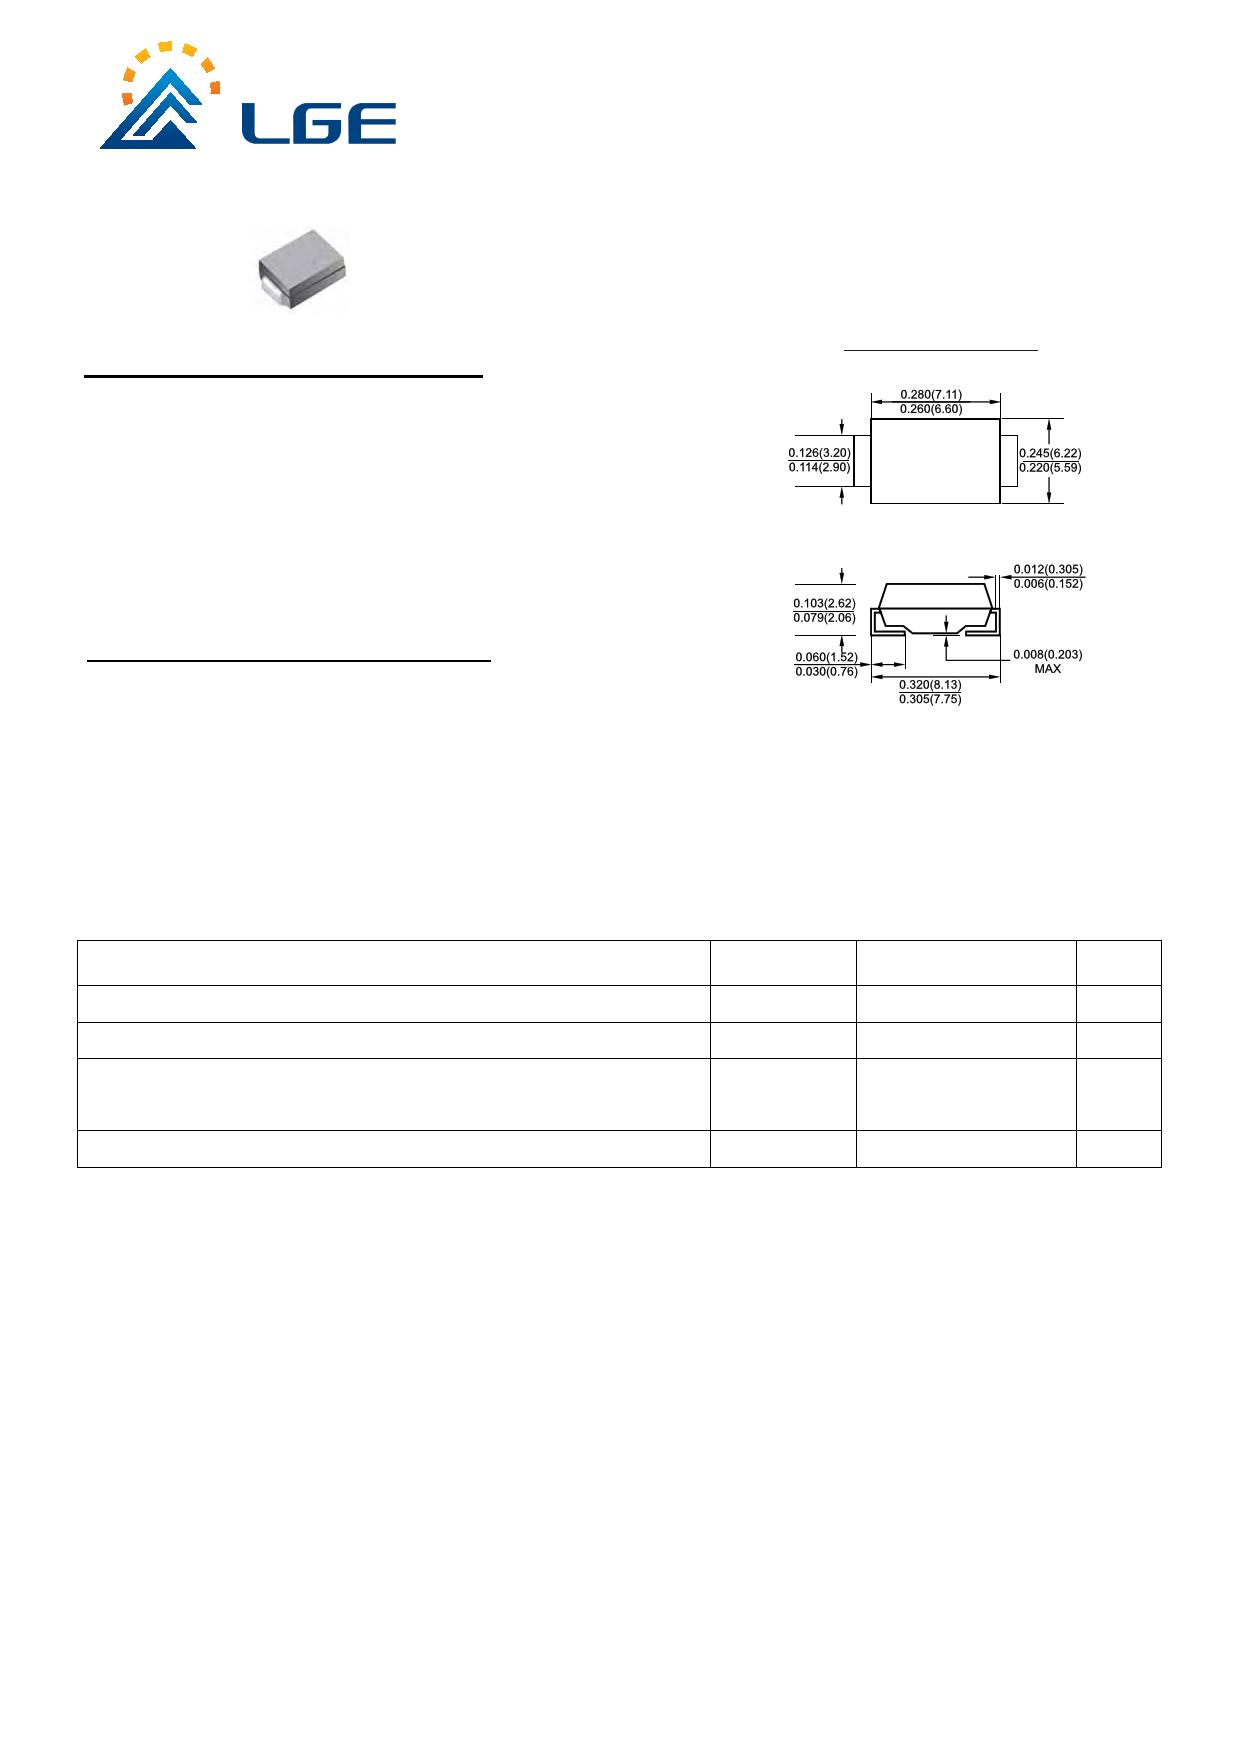 3.0SMCJ22CA Datasheet, 3.0SMCJ22CA PDF,ピン配置, 機能